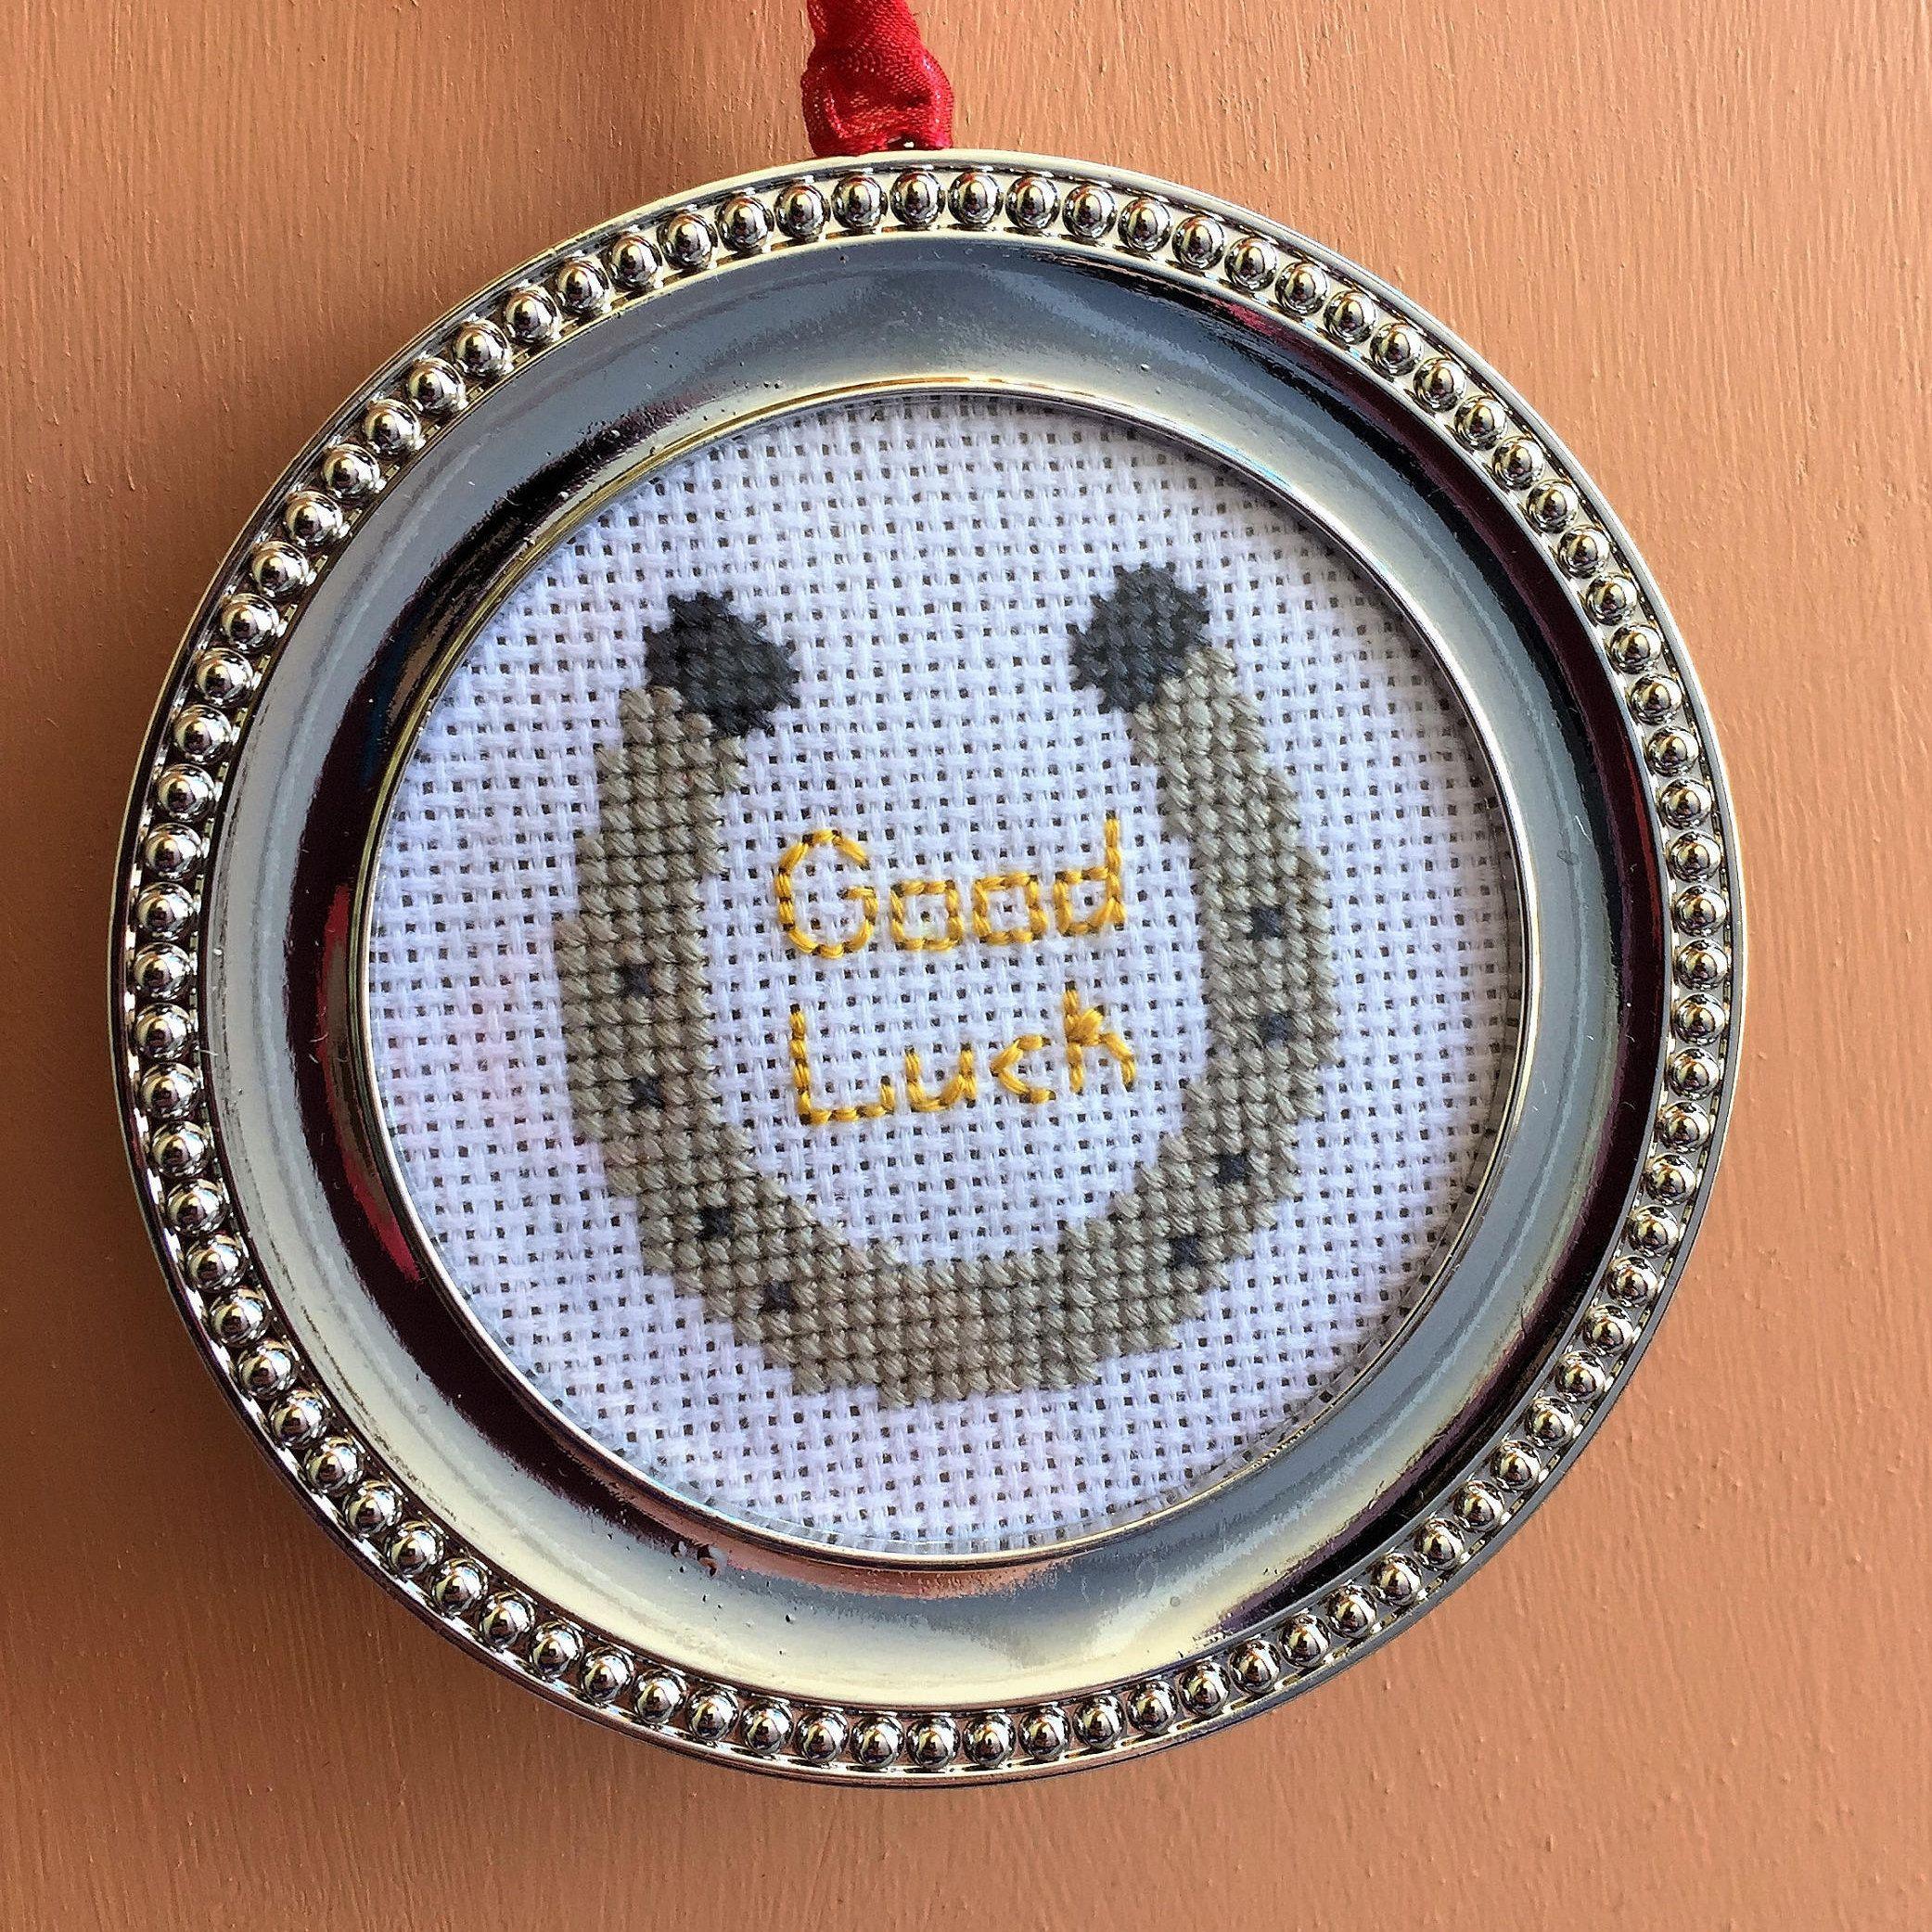 Handmade Good Luck Horseshoe Cross Stitch In Metal Frame